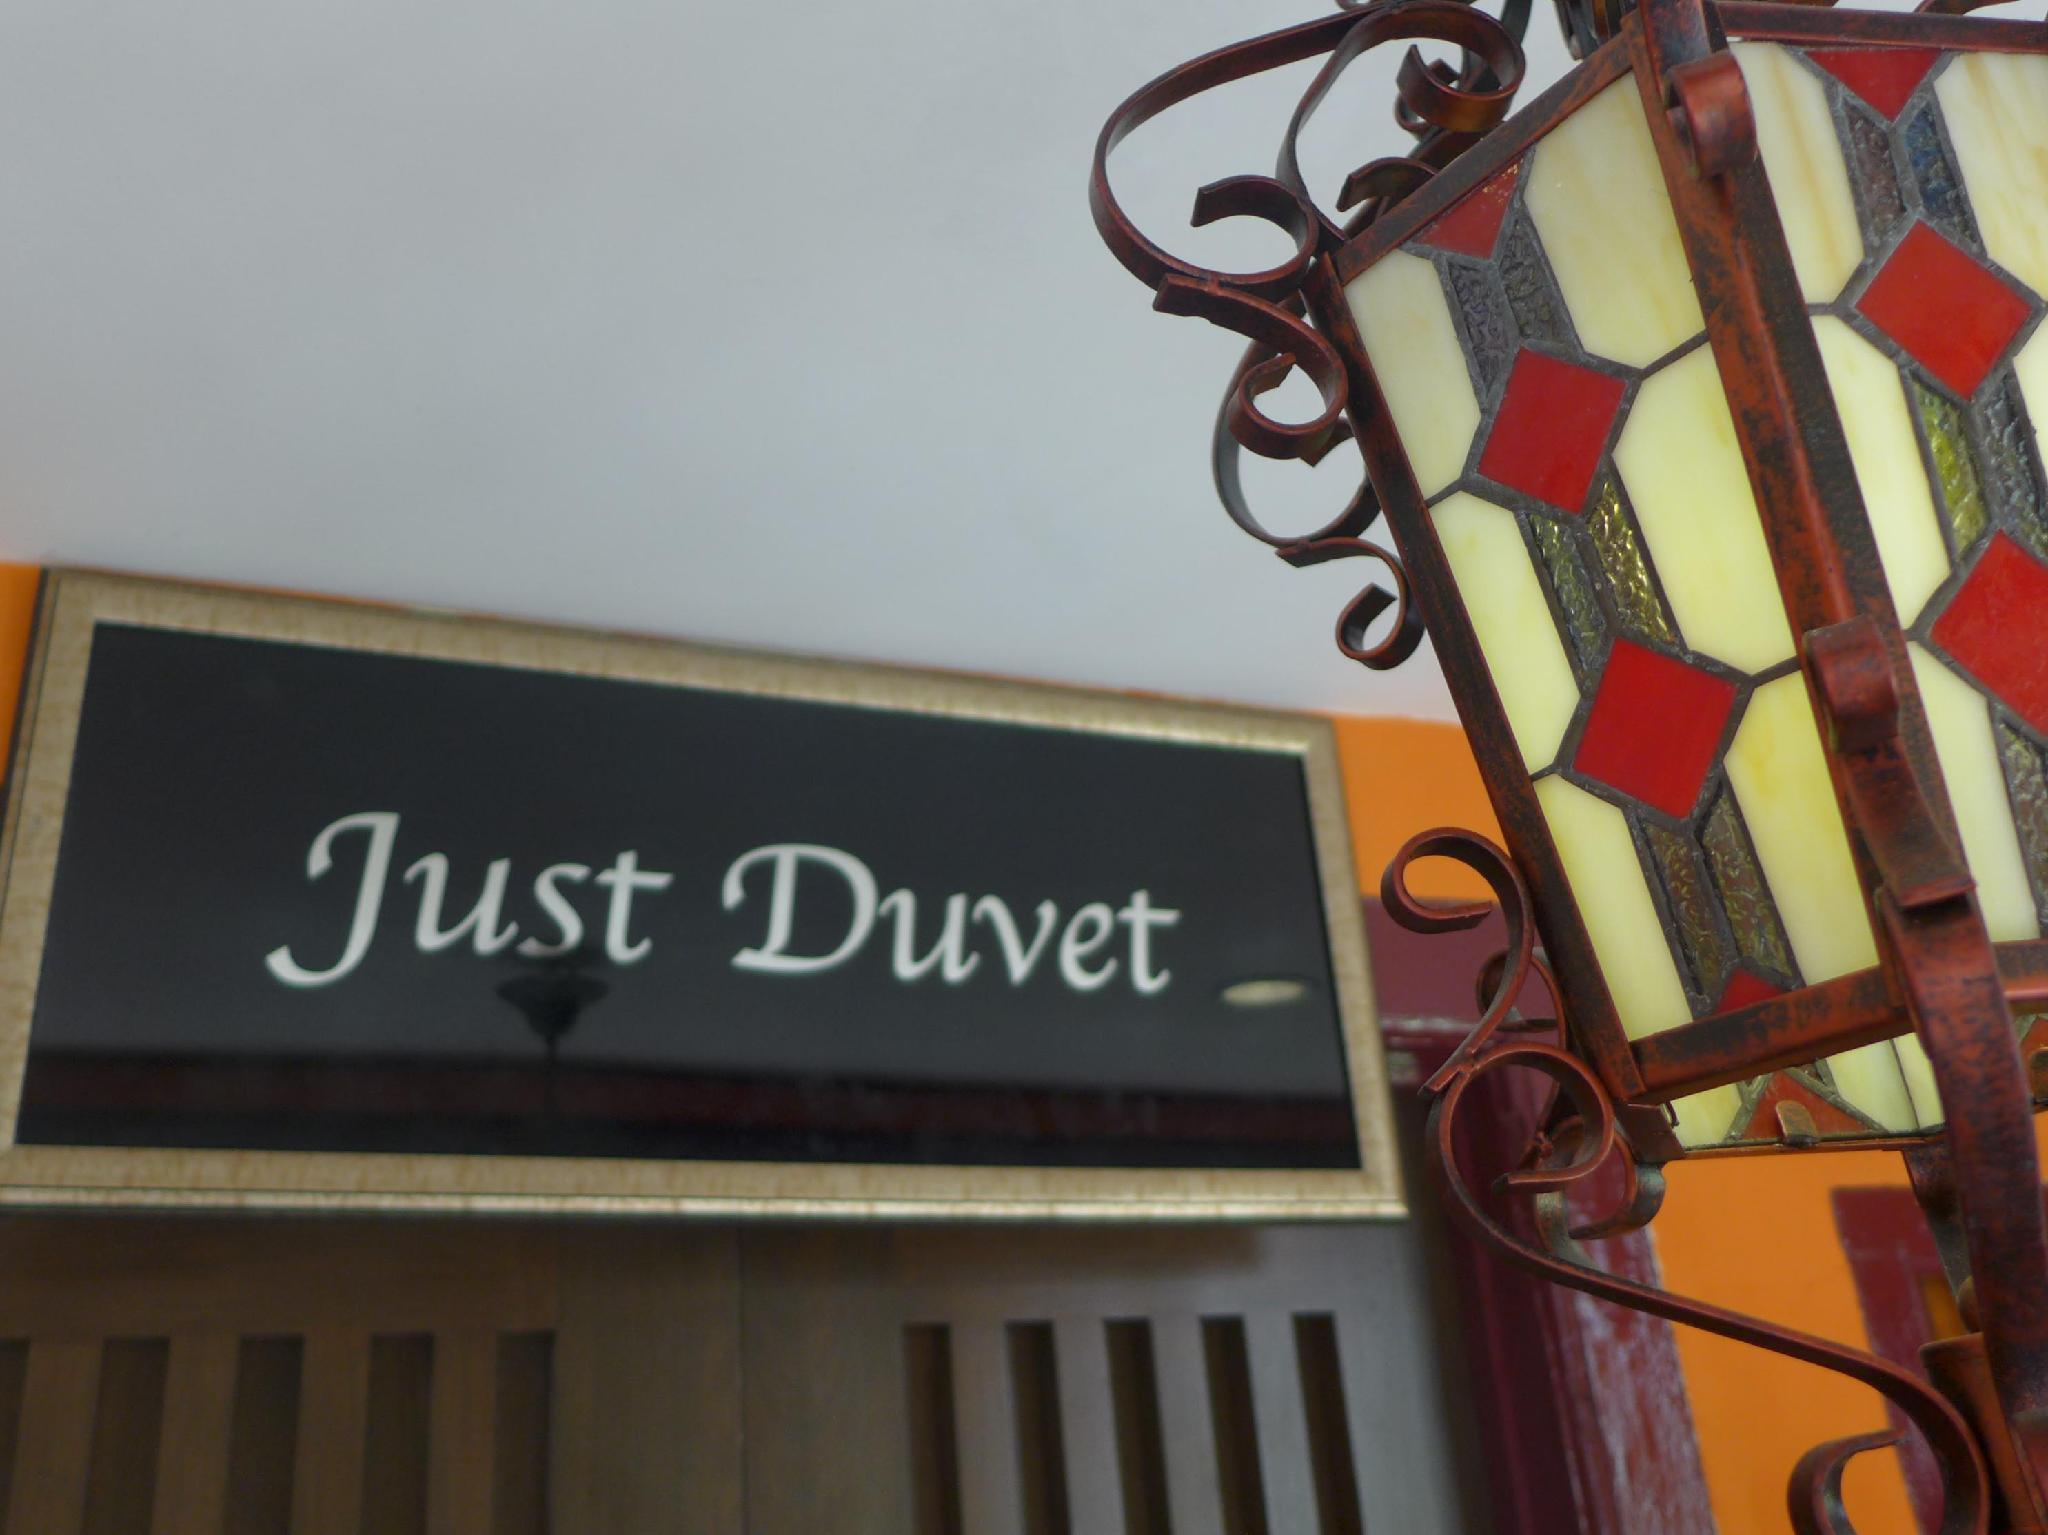 Just Duvet Guest House, Pulau Penang